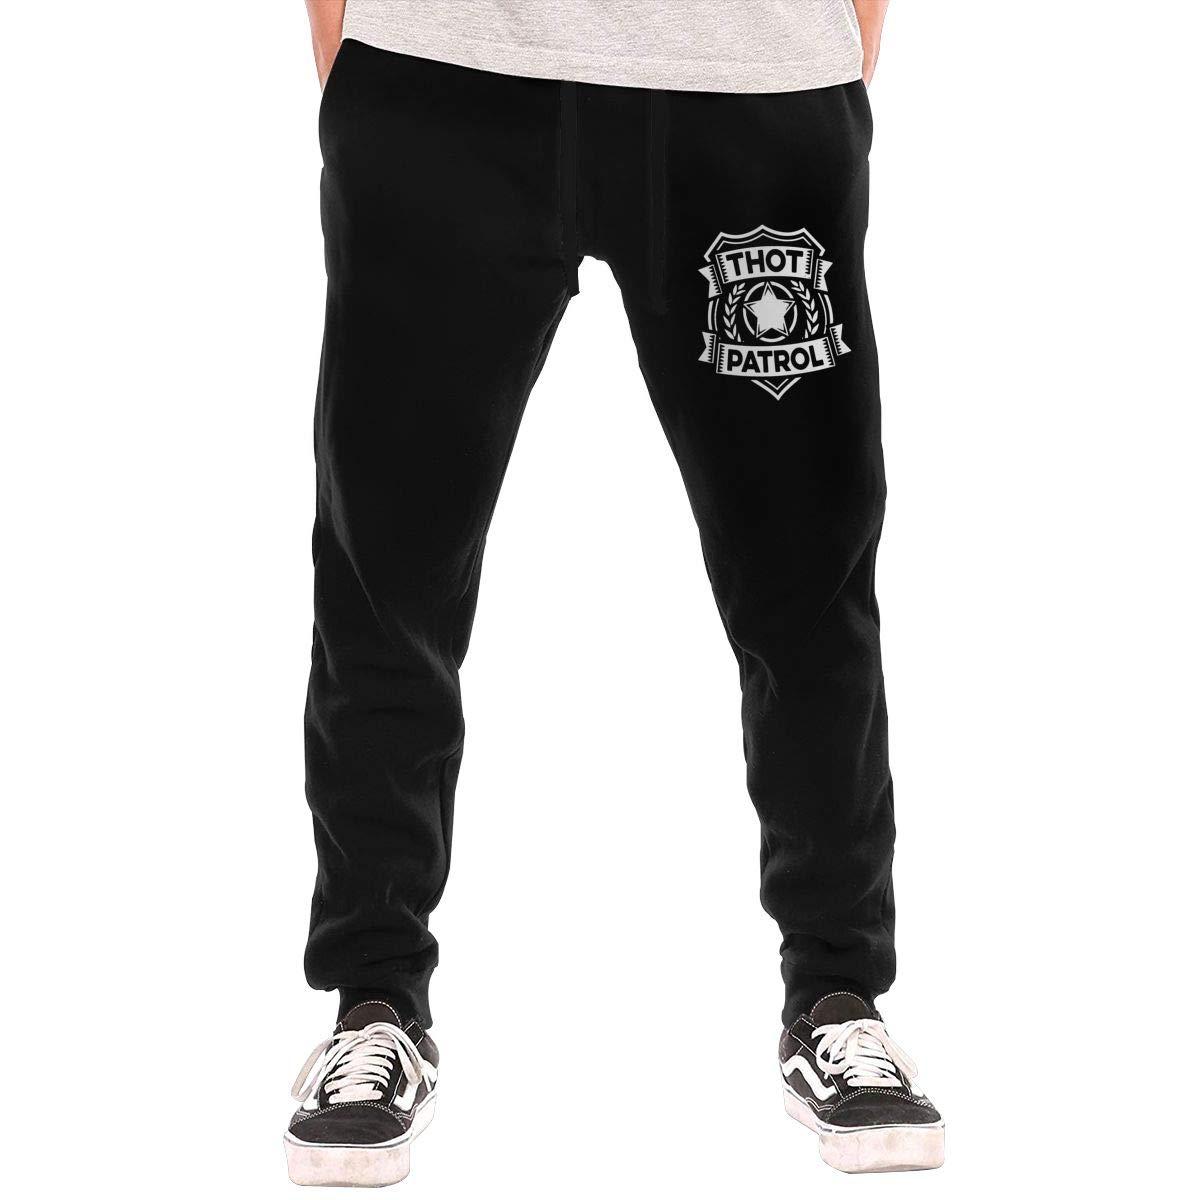 Dbou Thot Patrol Drawstring Waist,100/% Cotton,Elastic Waist Cuffed,Jogger Sweatpants Black